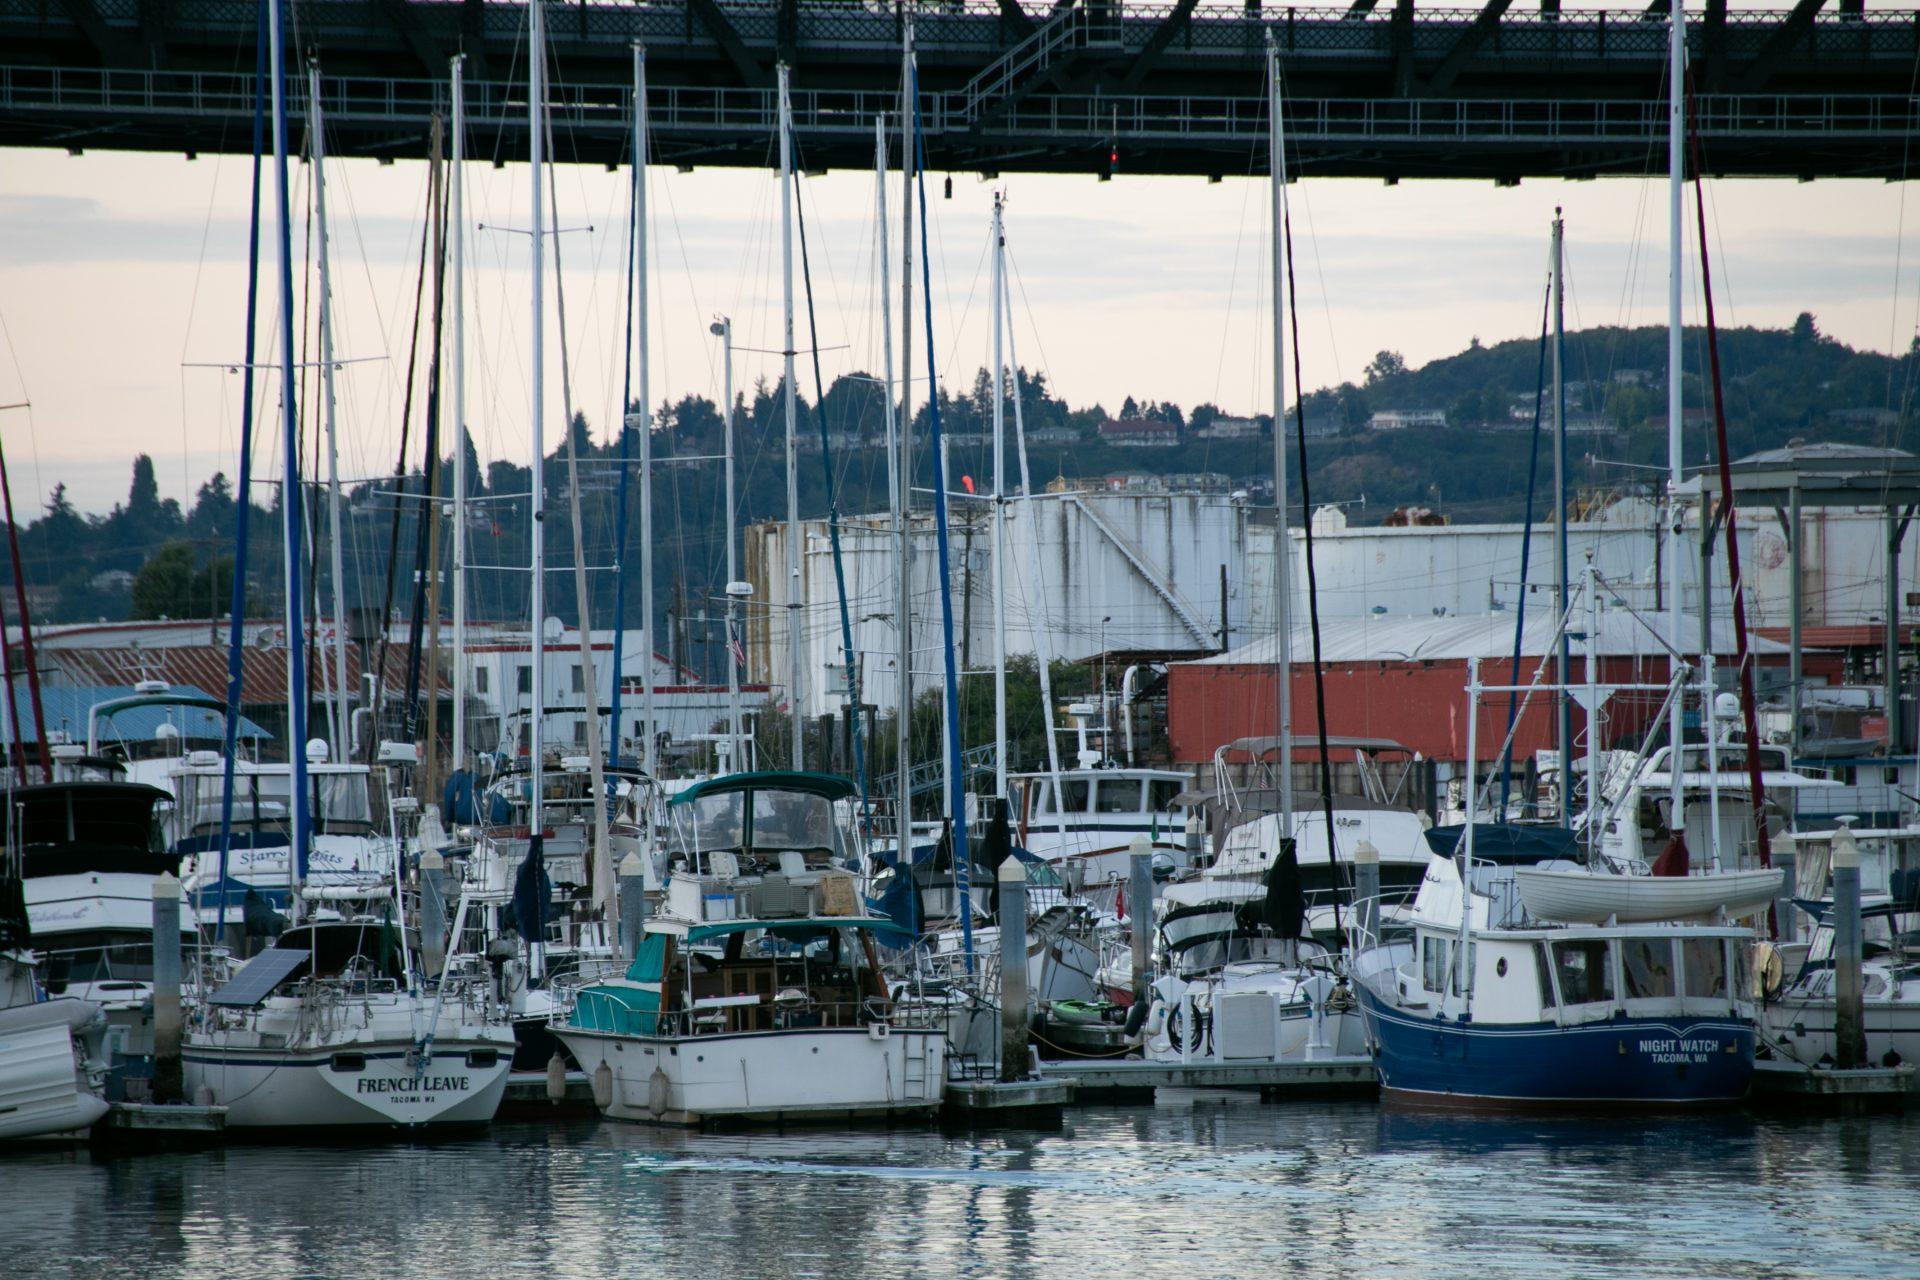 Moored Boats To Pier Near Bridge